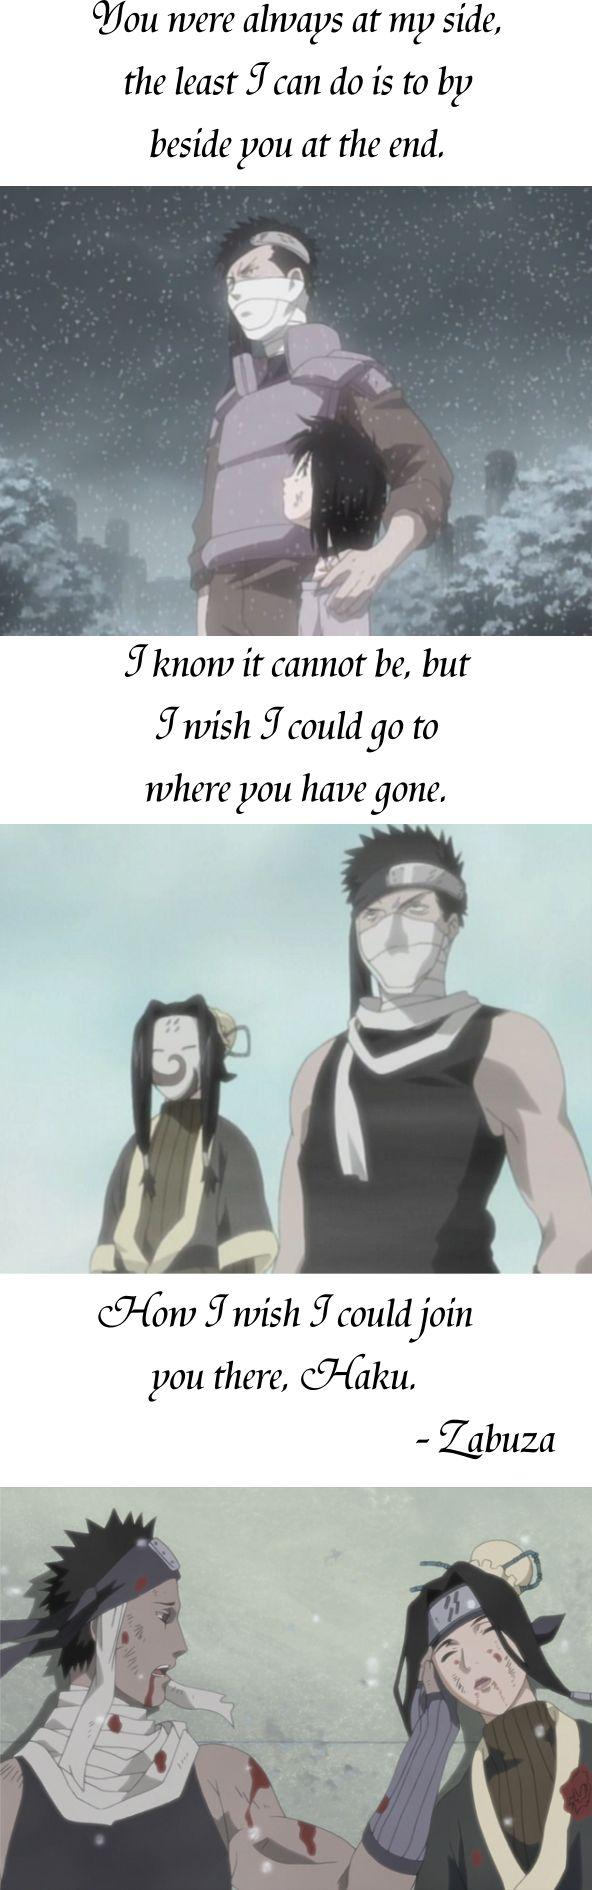 Last moment. | Anime/manga: Naruto [Zabuza Momochi x Haku] | #quotes